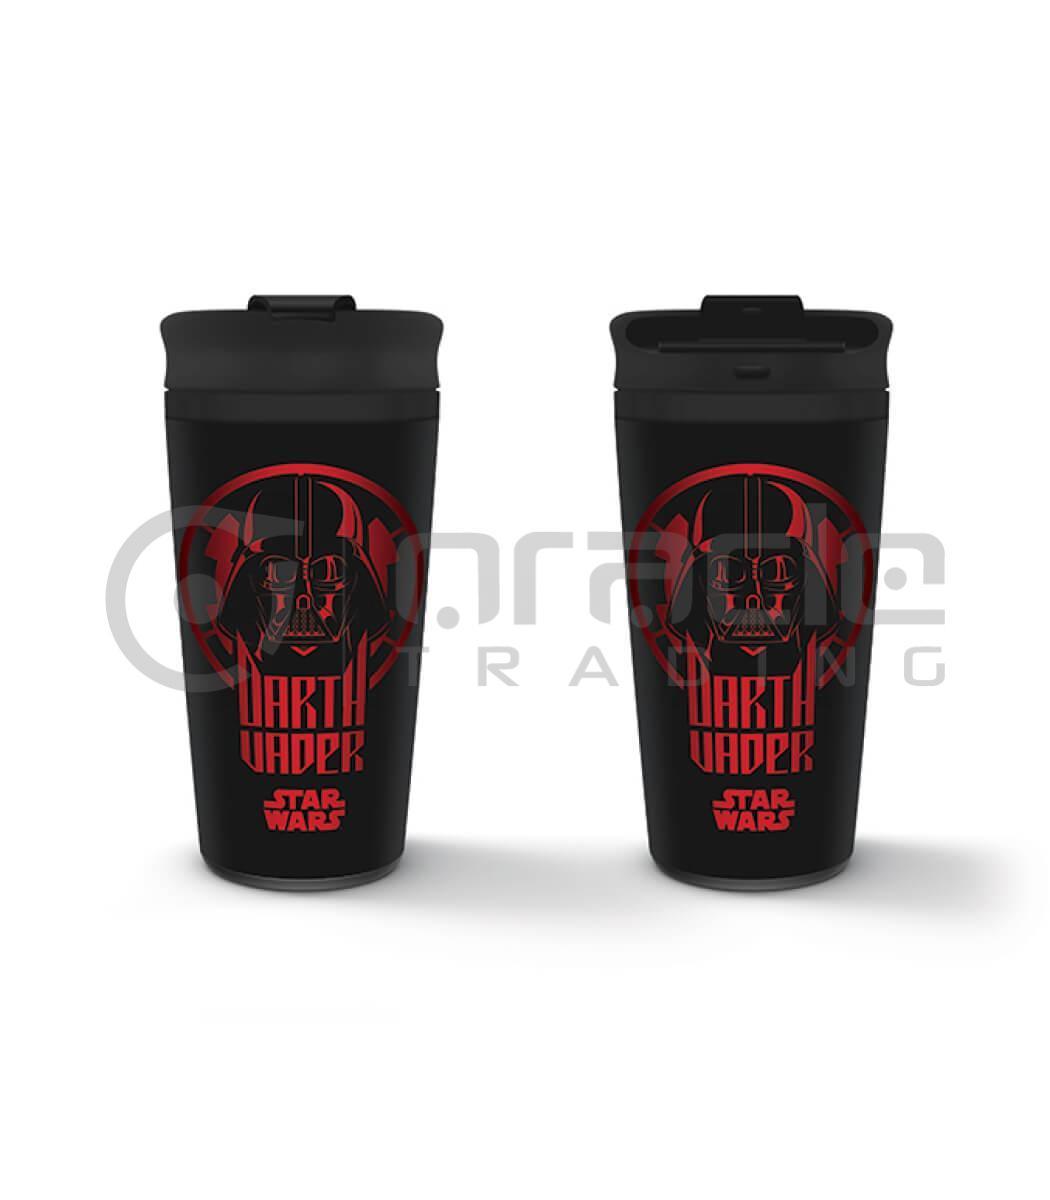 Star Wars Metal Travel Mug - Darth Vader